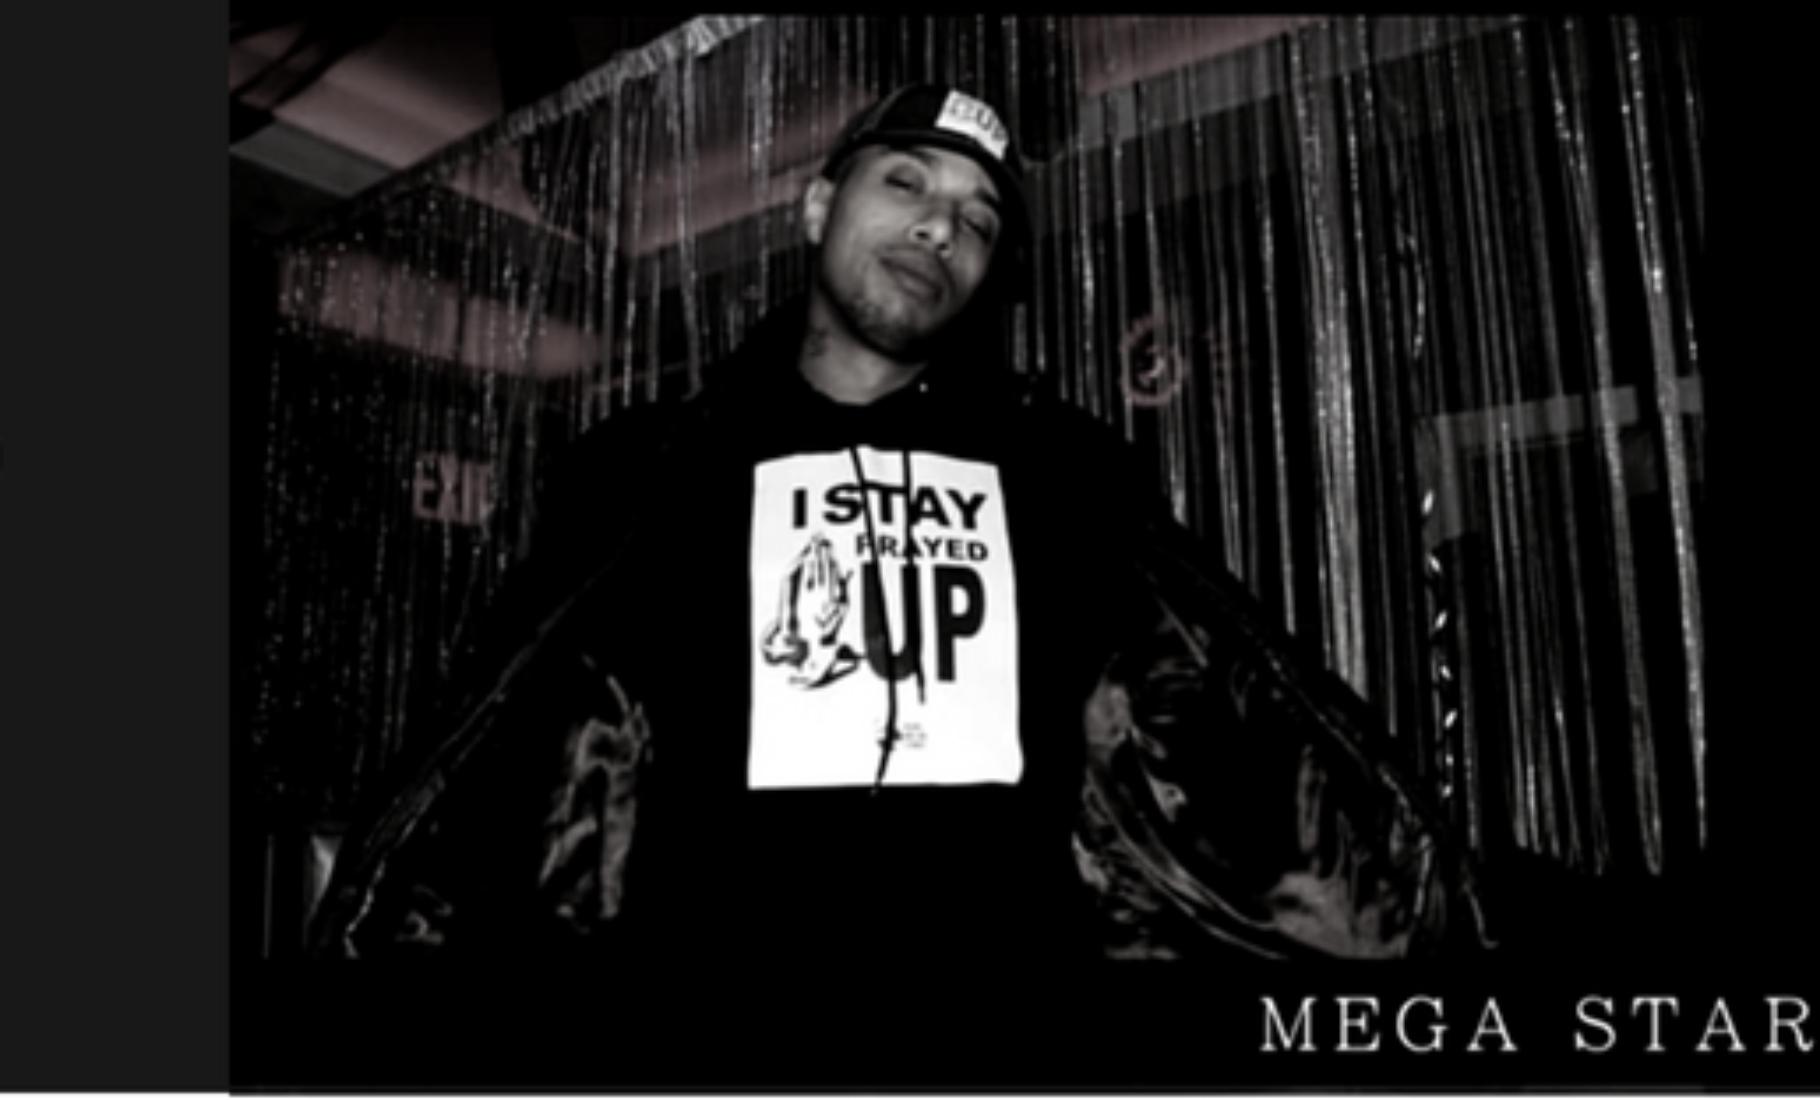 Megastar Brand